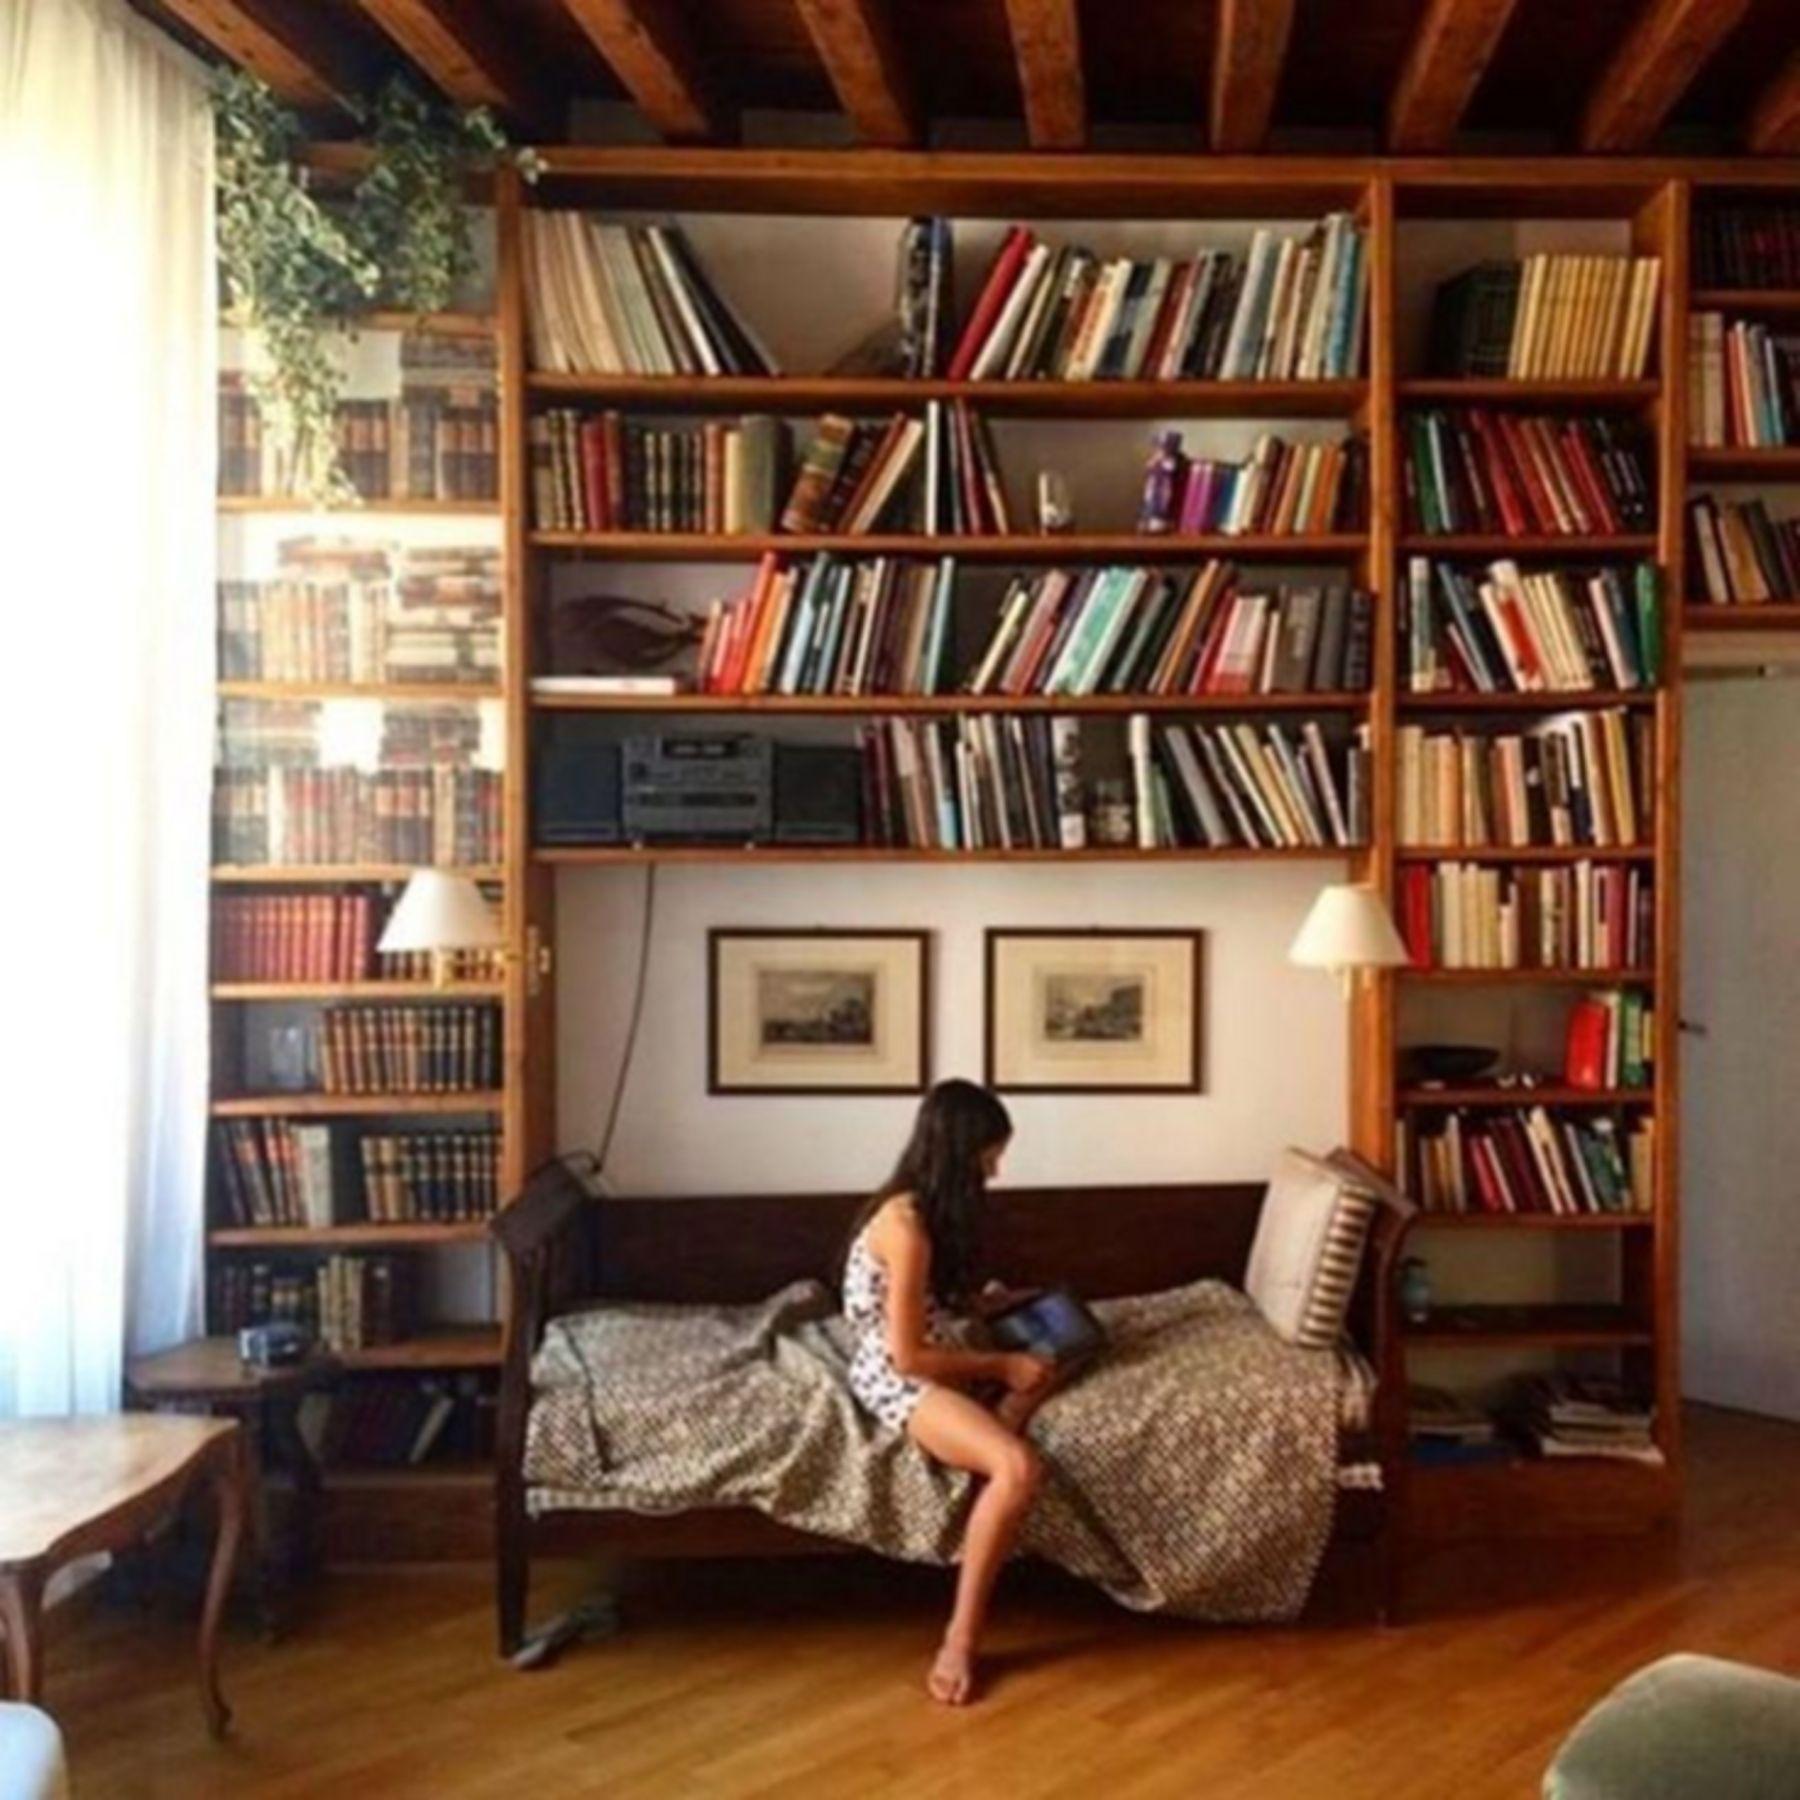 Top 12 Minimalist Bookshelf Design Ideas For Your Bedroom Interior Bookshelves In Bedroom Minimalist Bookshelves Home